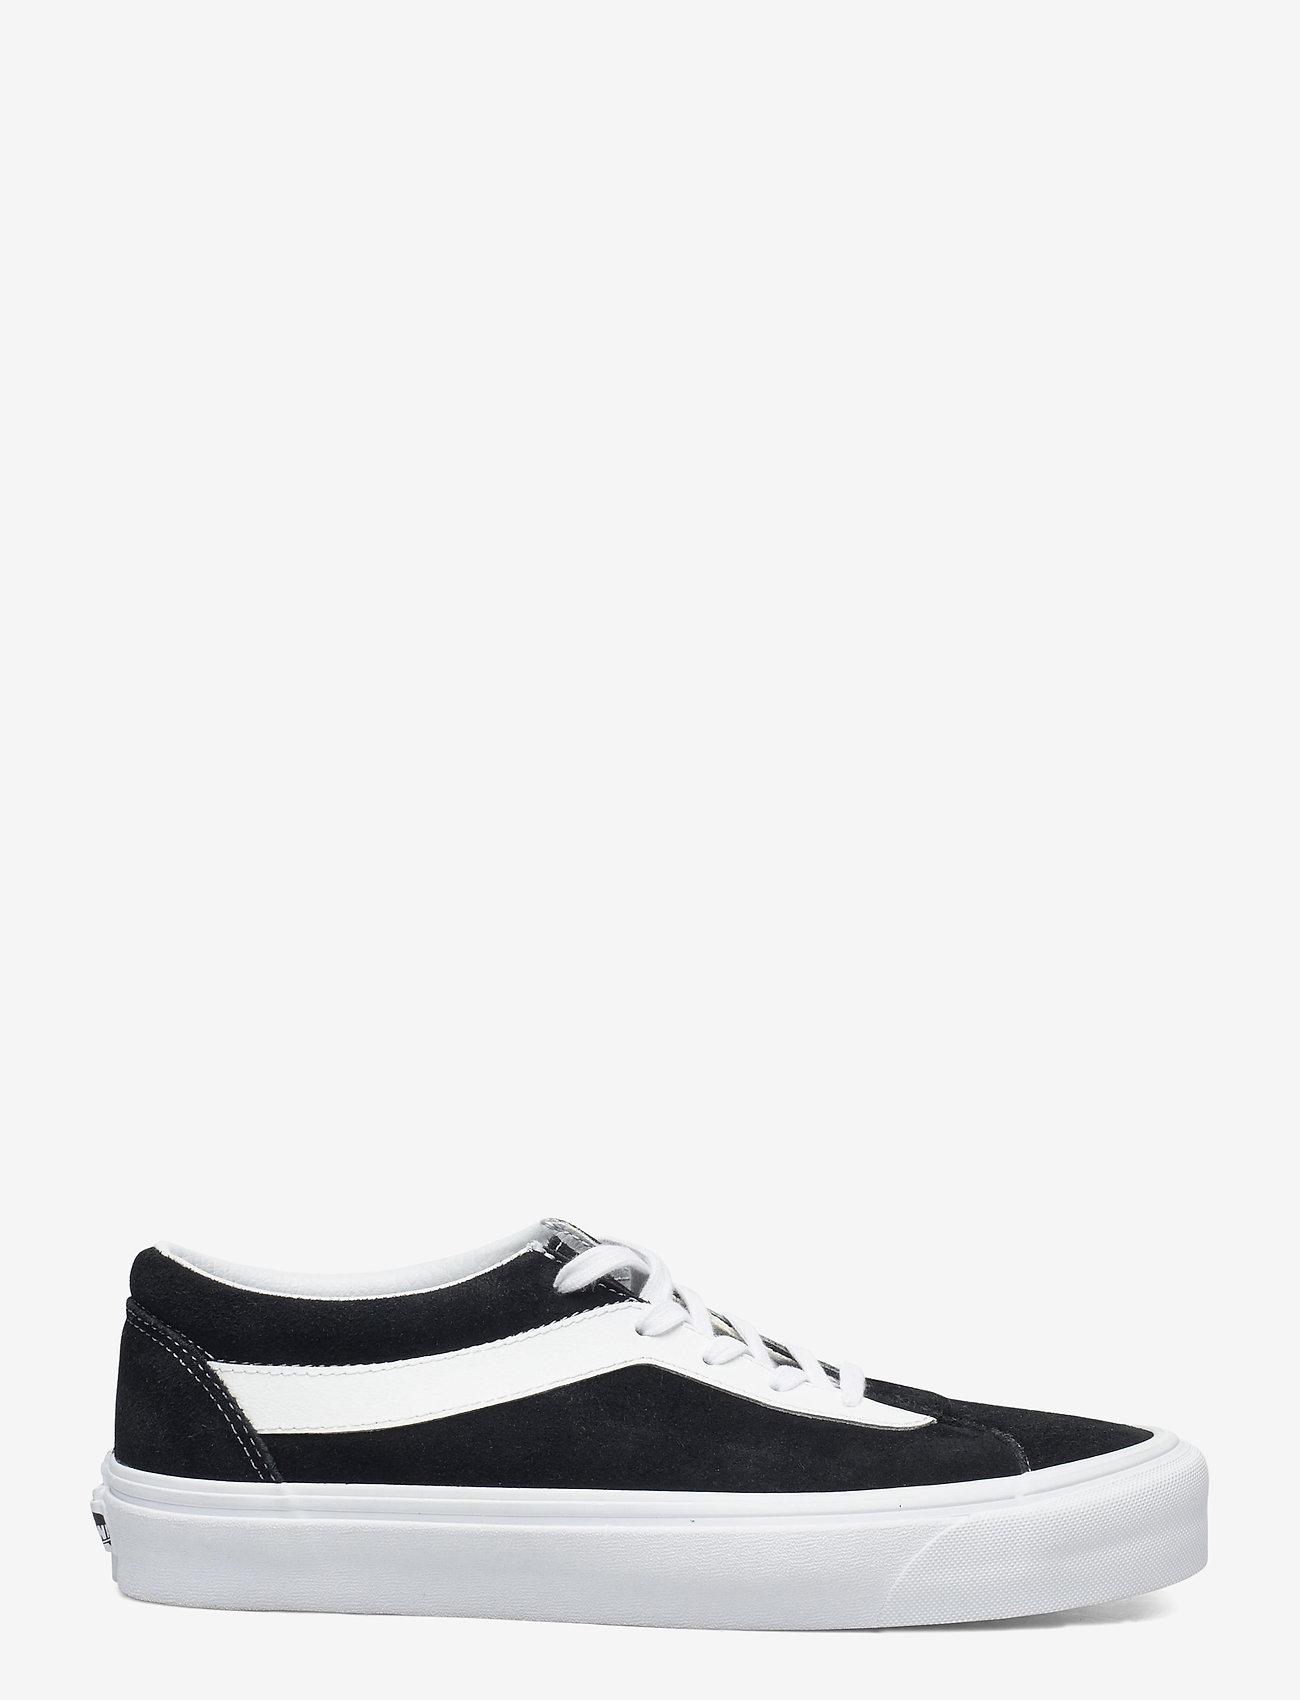 VANS - UA Bold NI - laag sneakers - (staple) black/true white - 1